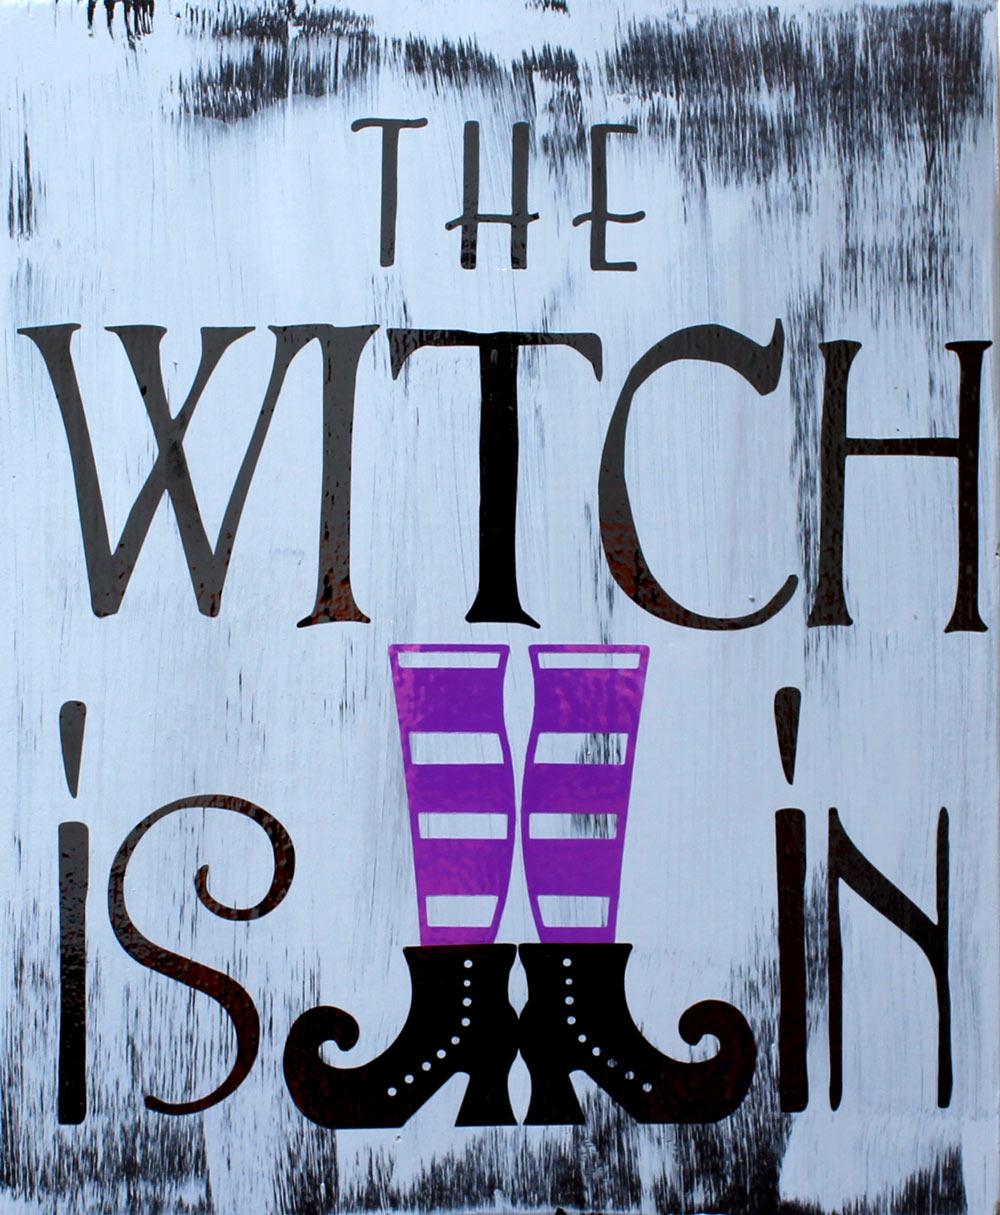 Halloween-Vinyl-Sign-Witch-Is-In